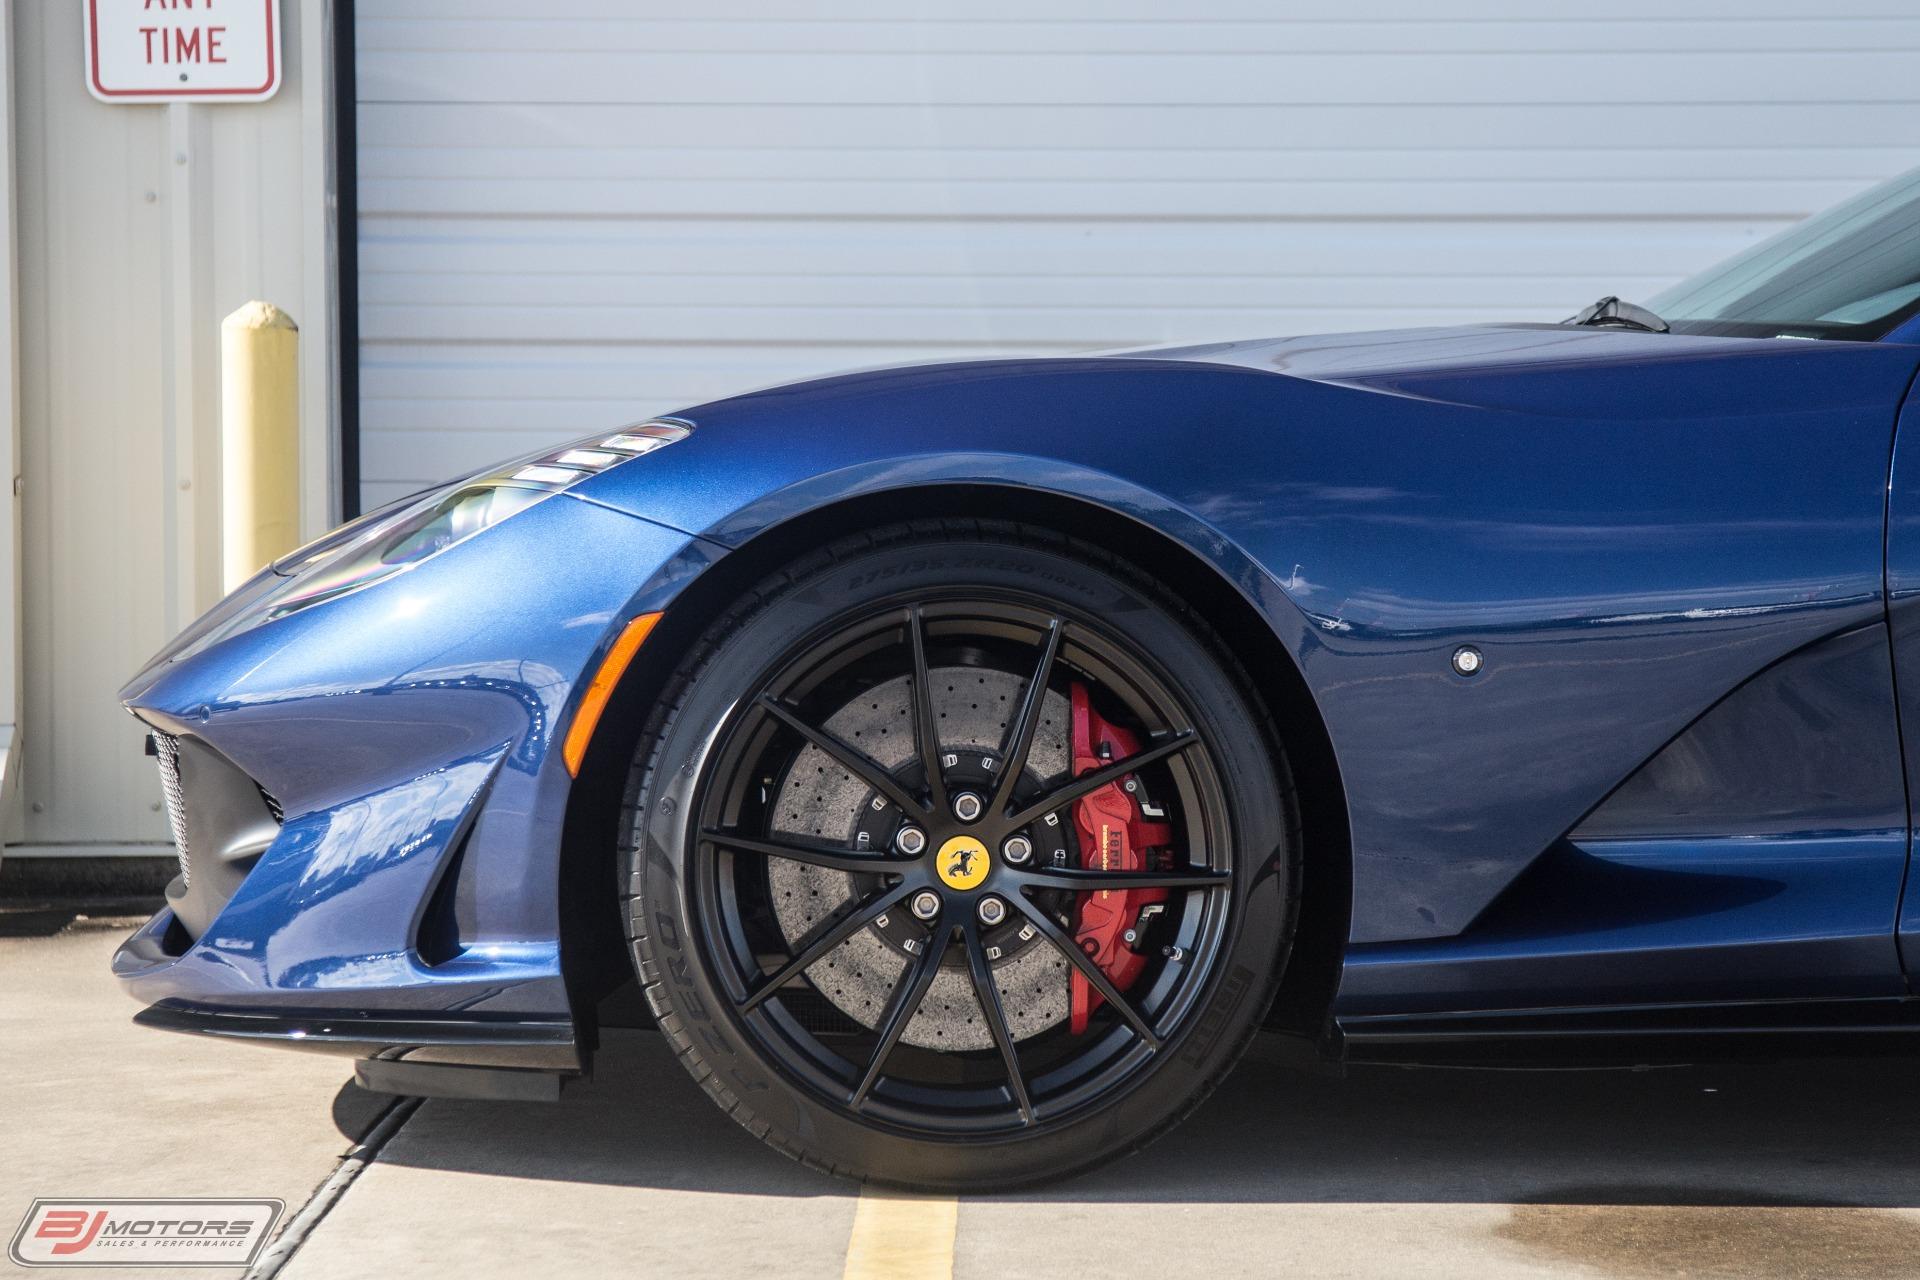 Used-2018-Ferrari-812-Superfast-TDF-Blue-w-Blue-Sterling-Chocolate